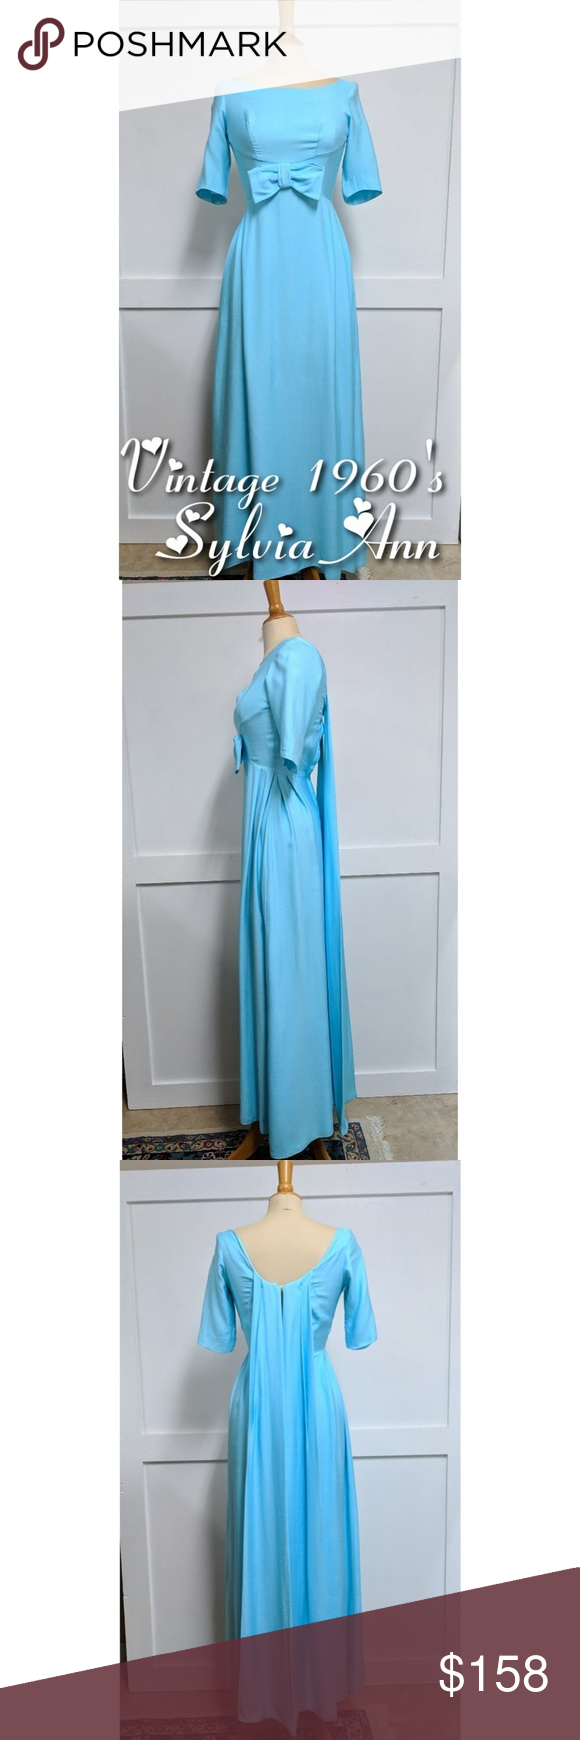 Spotted While Shopping On Poshmark Vintage 1960 S Sylvia Ann Blue Prom Dress 8 Poshmark Fashion Shop Prom Dresses Vintage Prom Dresses Blue Clothes Design [ 1740 x 580 Pixel ]